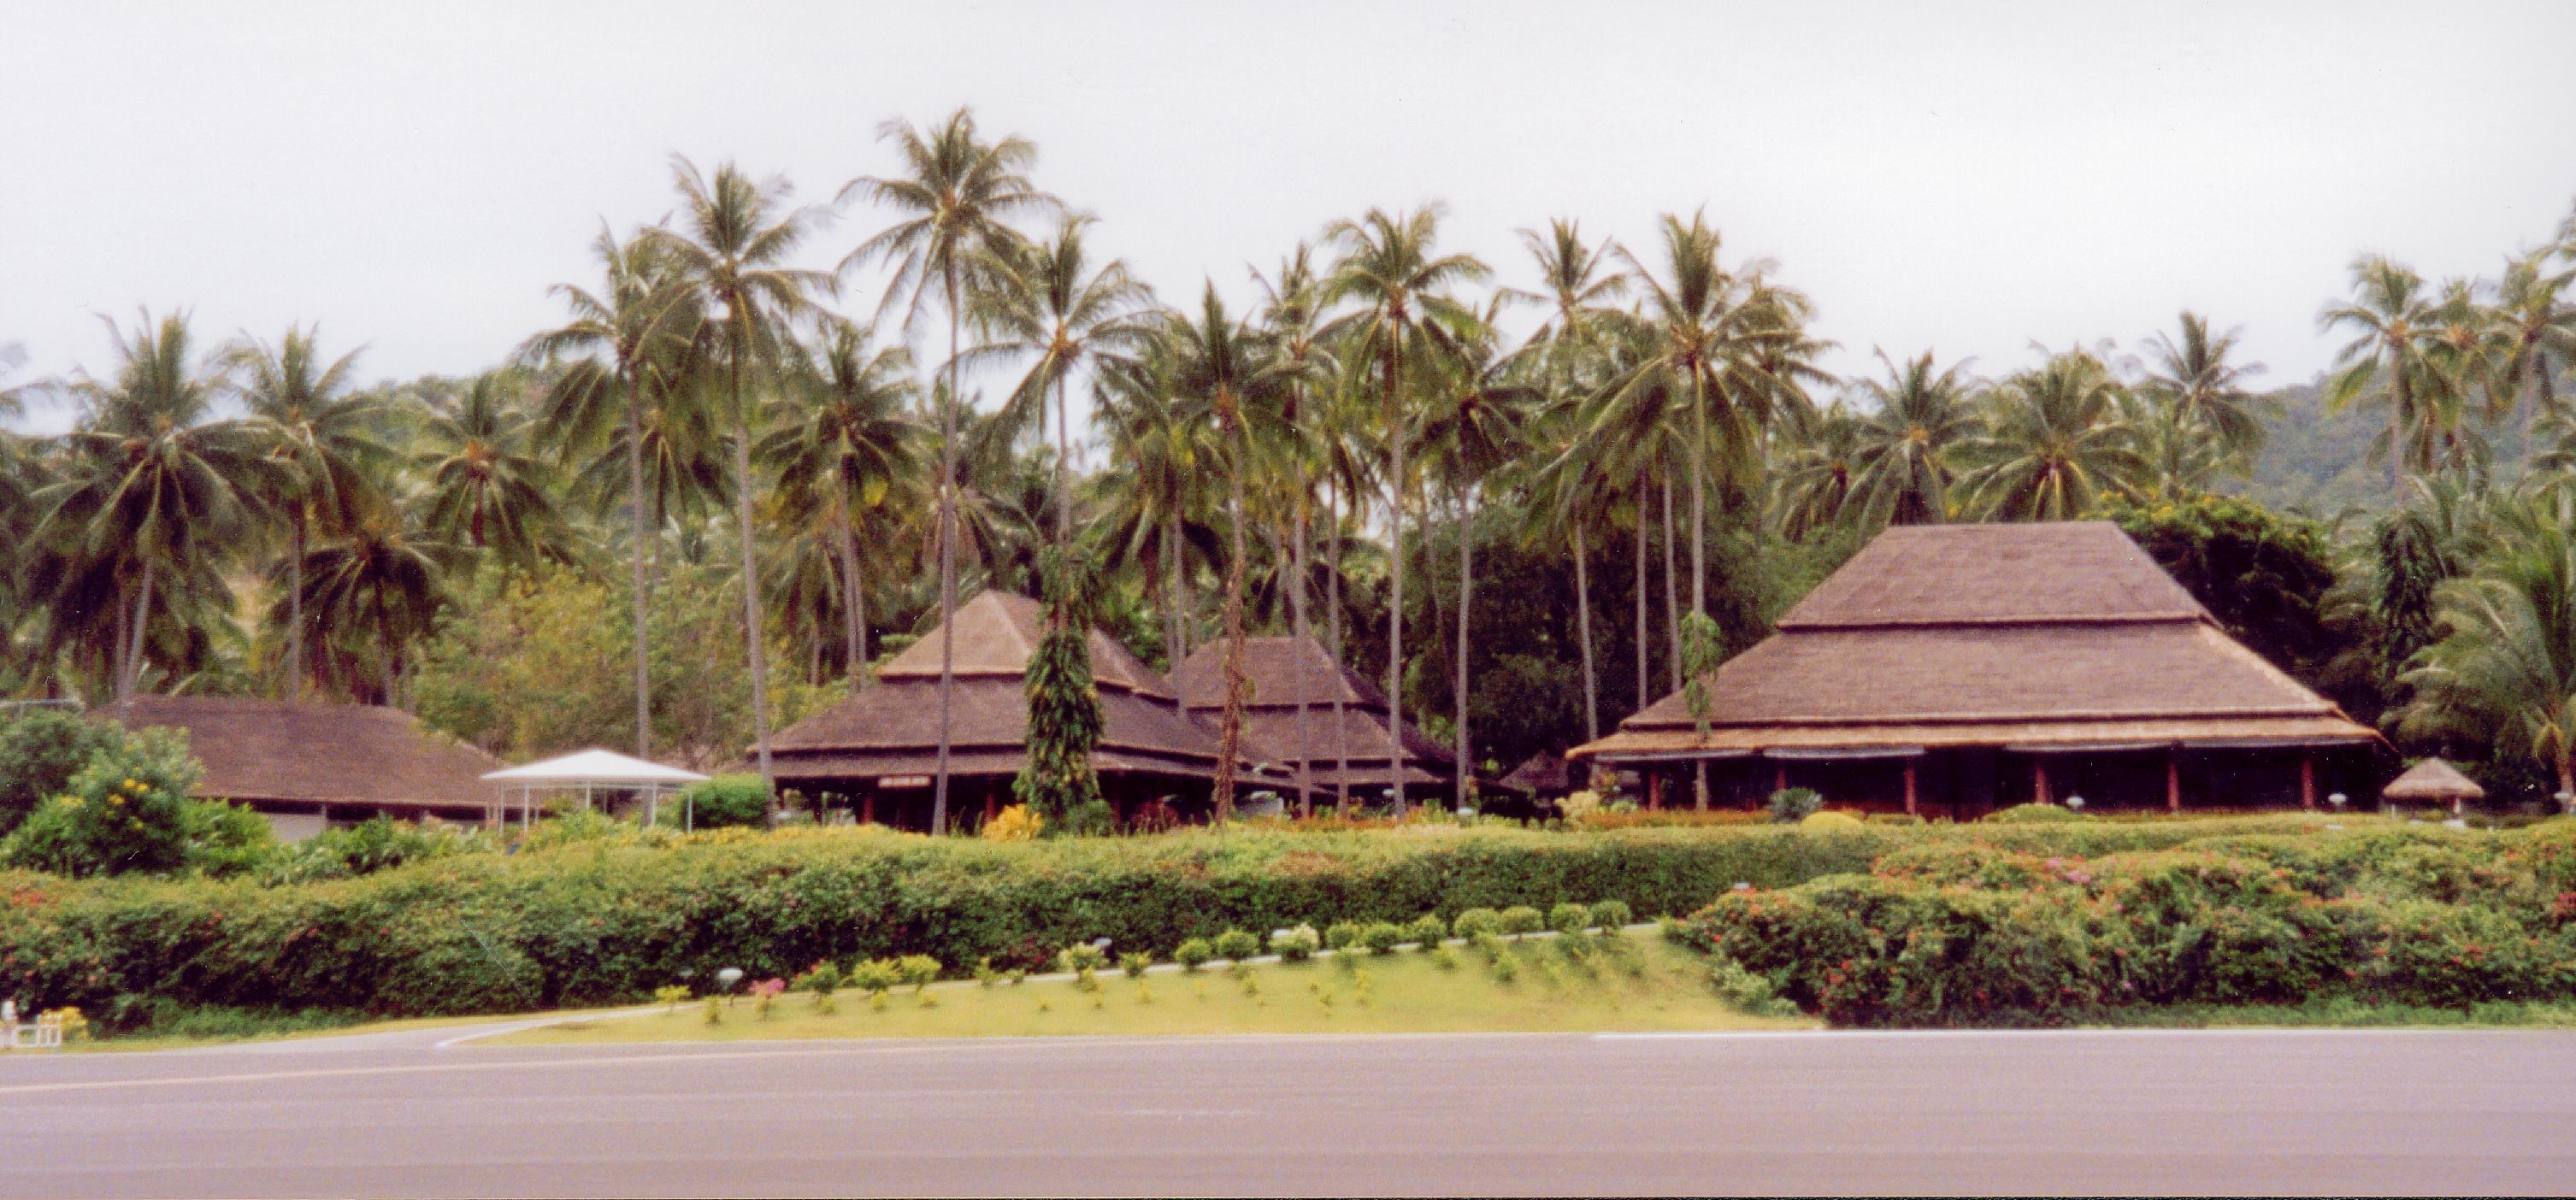 Aeroporto Koh Samui : File koh samui airport g wikimedia commons